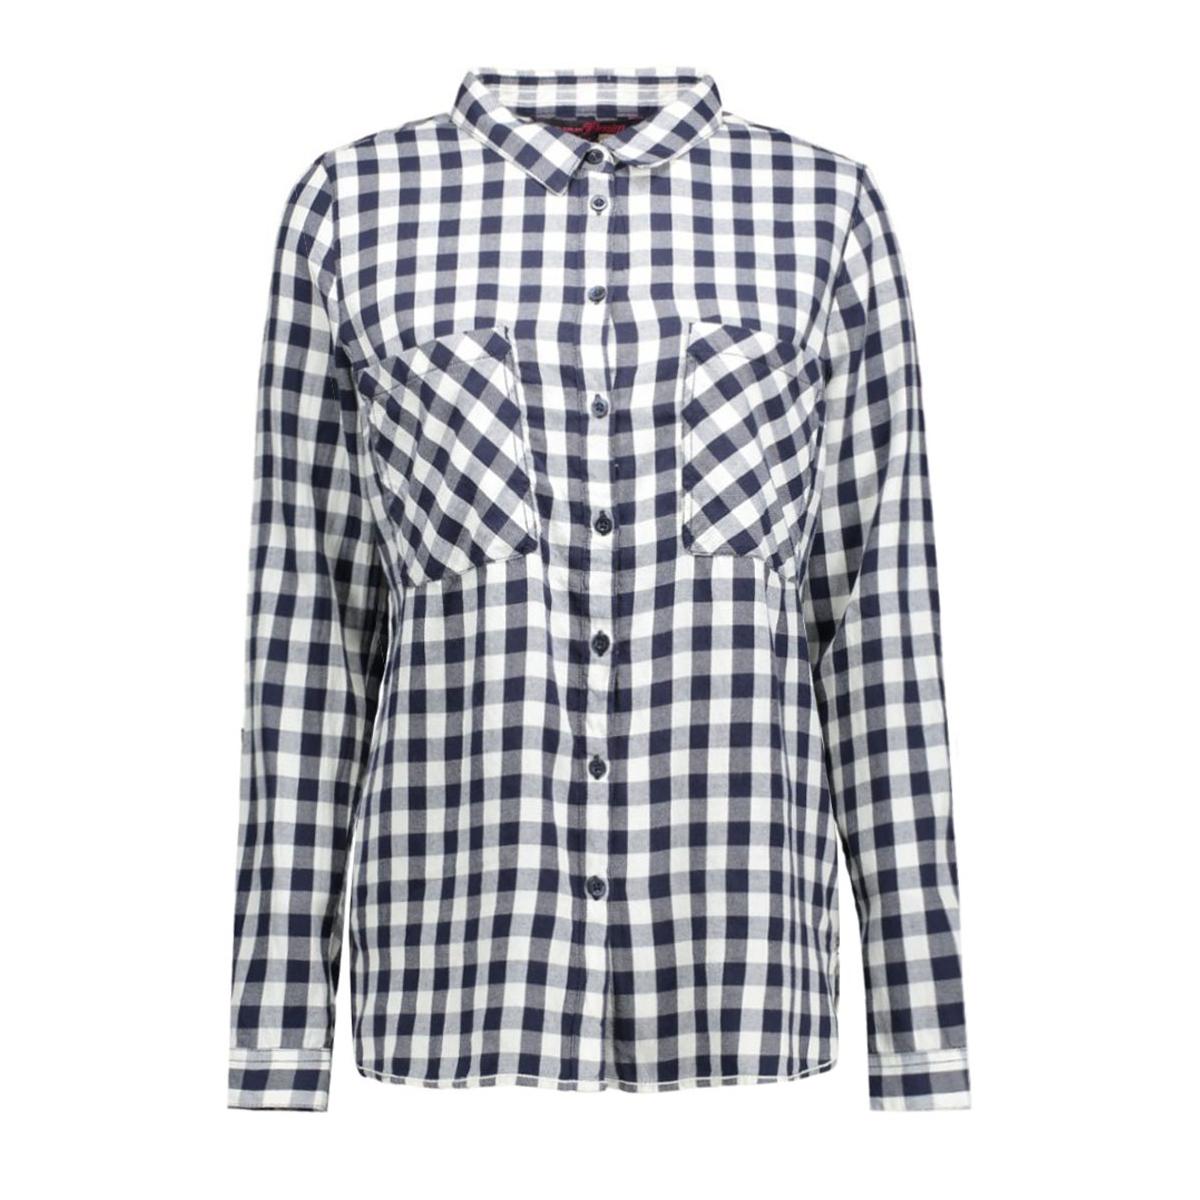 2032160.09.71 tom tailor blouse 6901